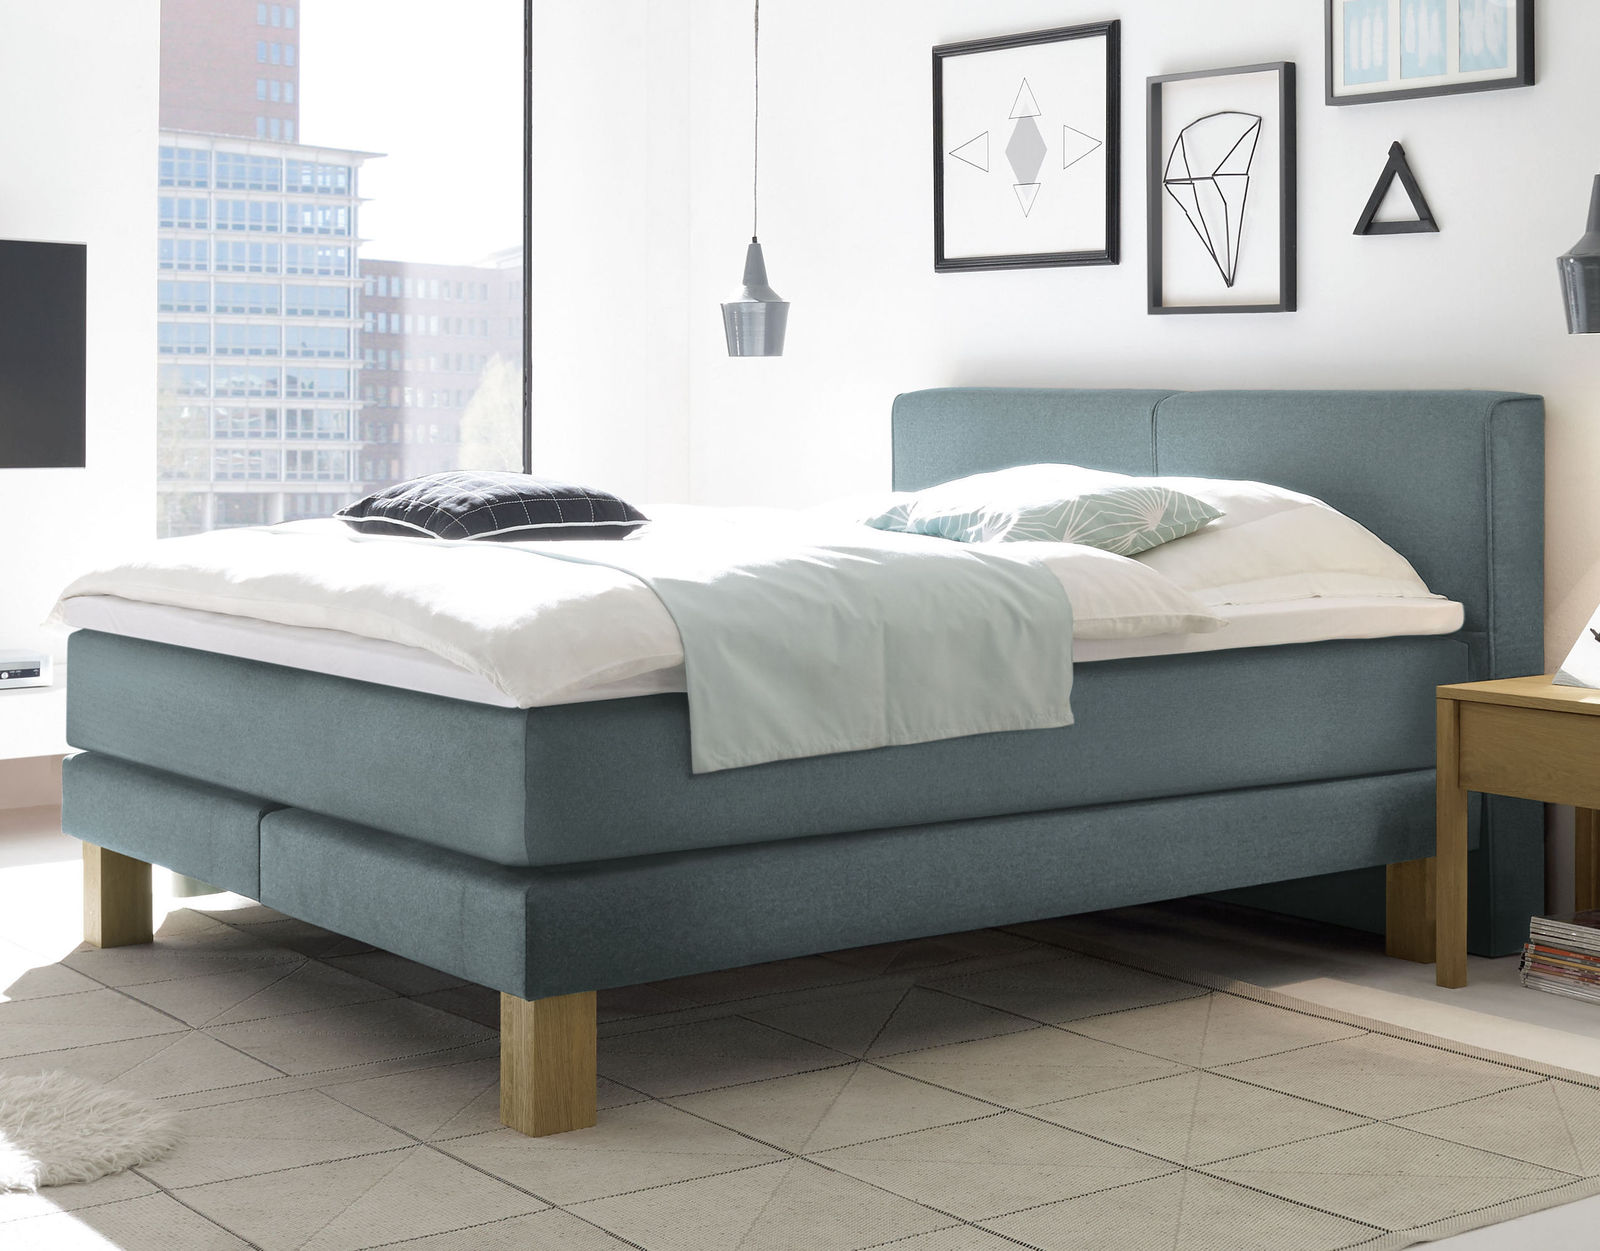 boxspringbett f r dicke menschen individuell anpassbar coro. Black Bedroom Furniture Sets. Home Design Ideas